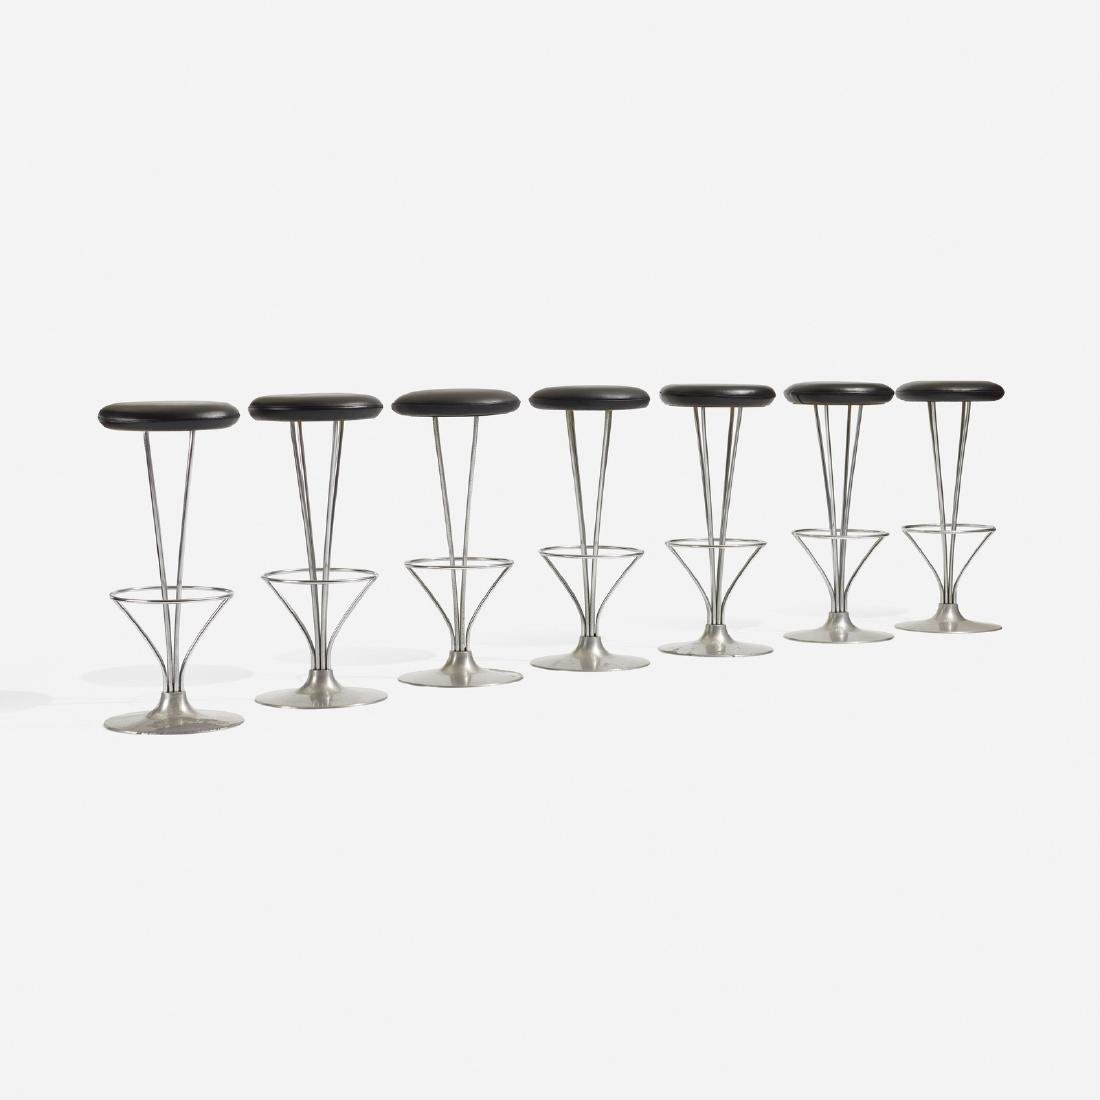 Piet Hein, stools, set of seven - 2